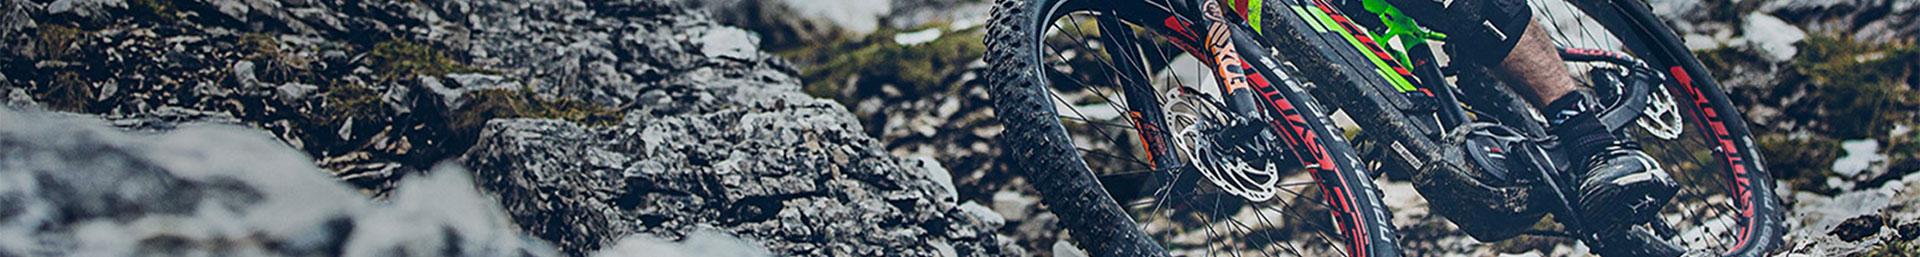 RS Moto